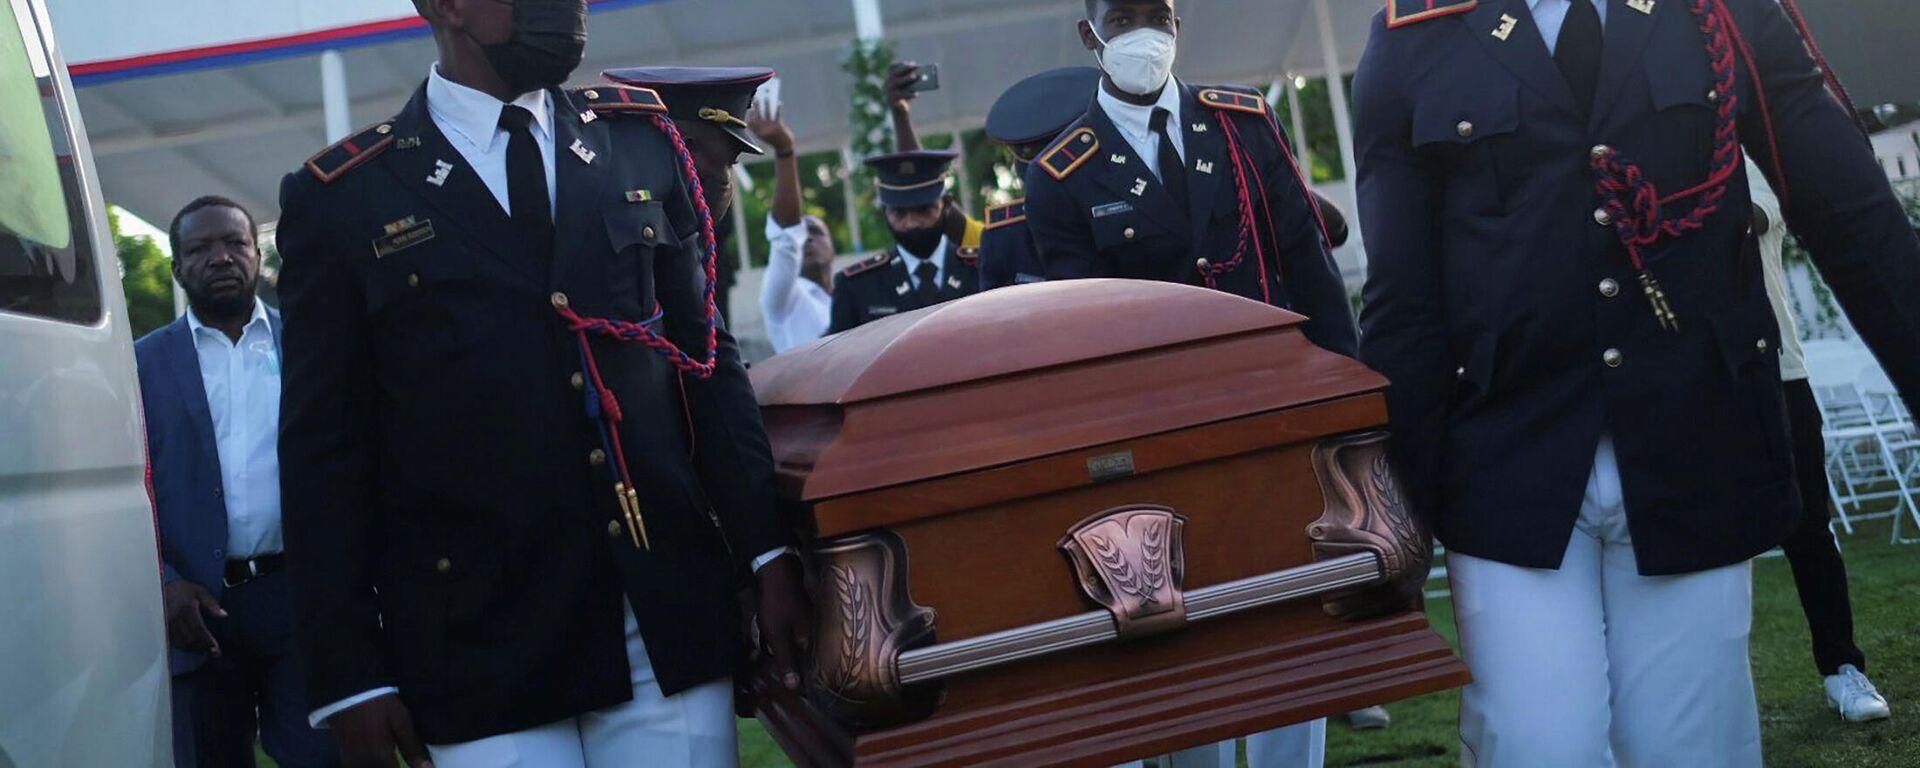 Los funerales nacionales del presidente asesinado de Haití, Jovenel Moise - Sputnik Mundo, 1920, 23.07.2021